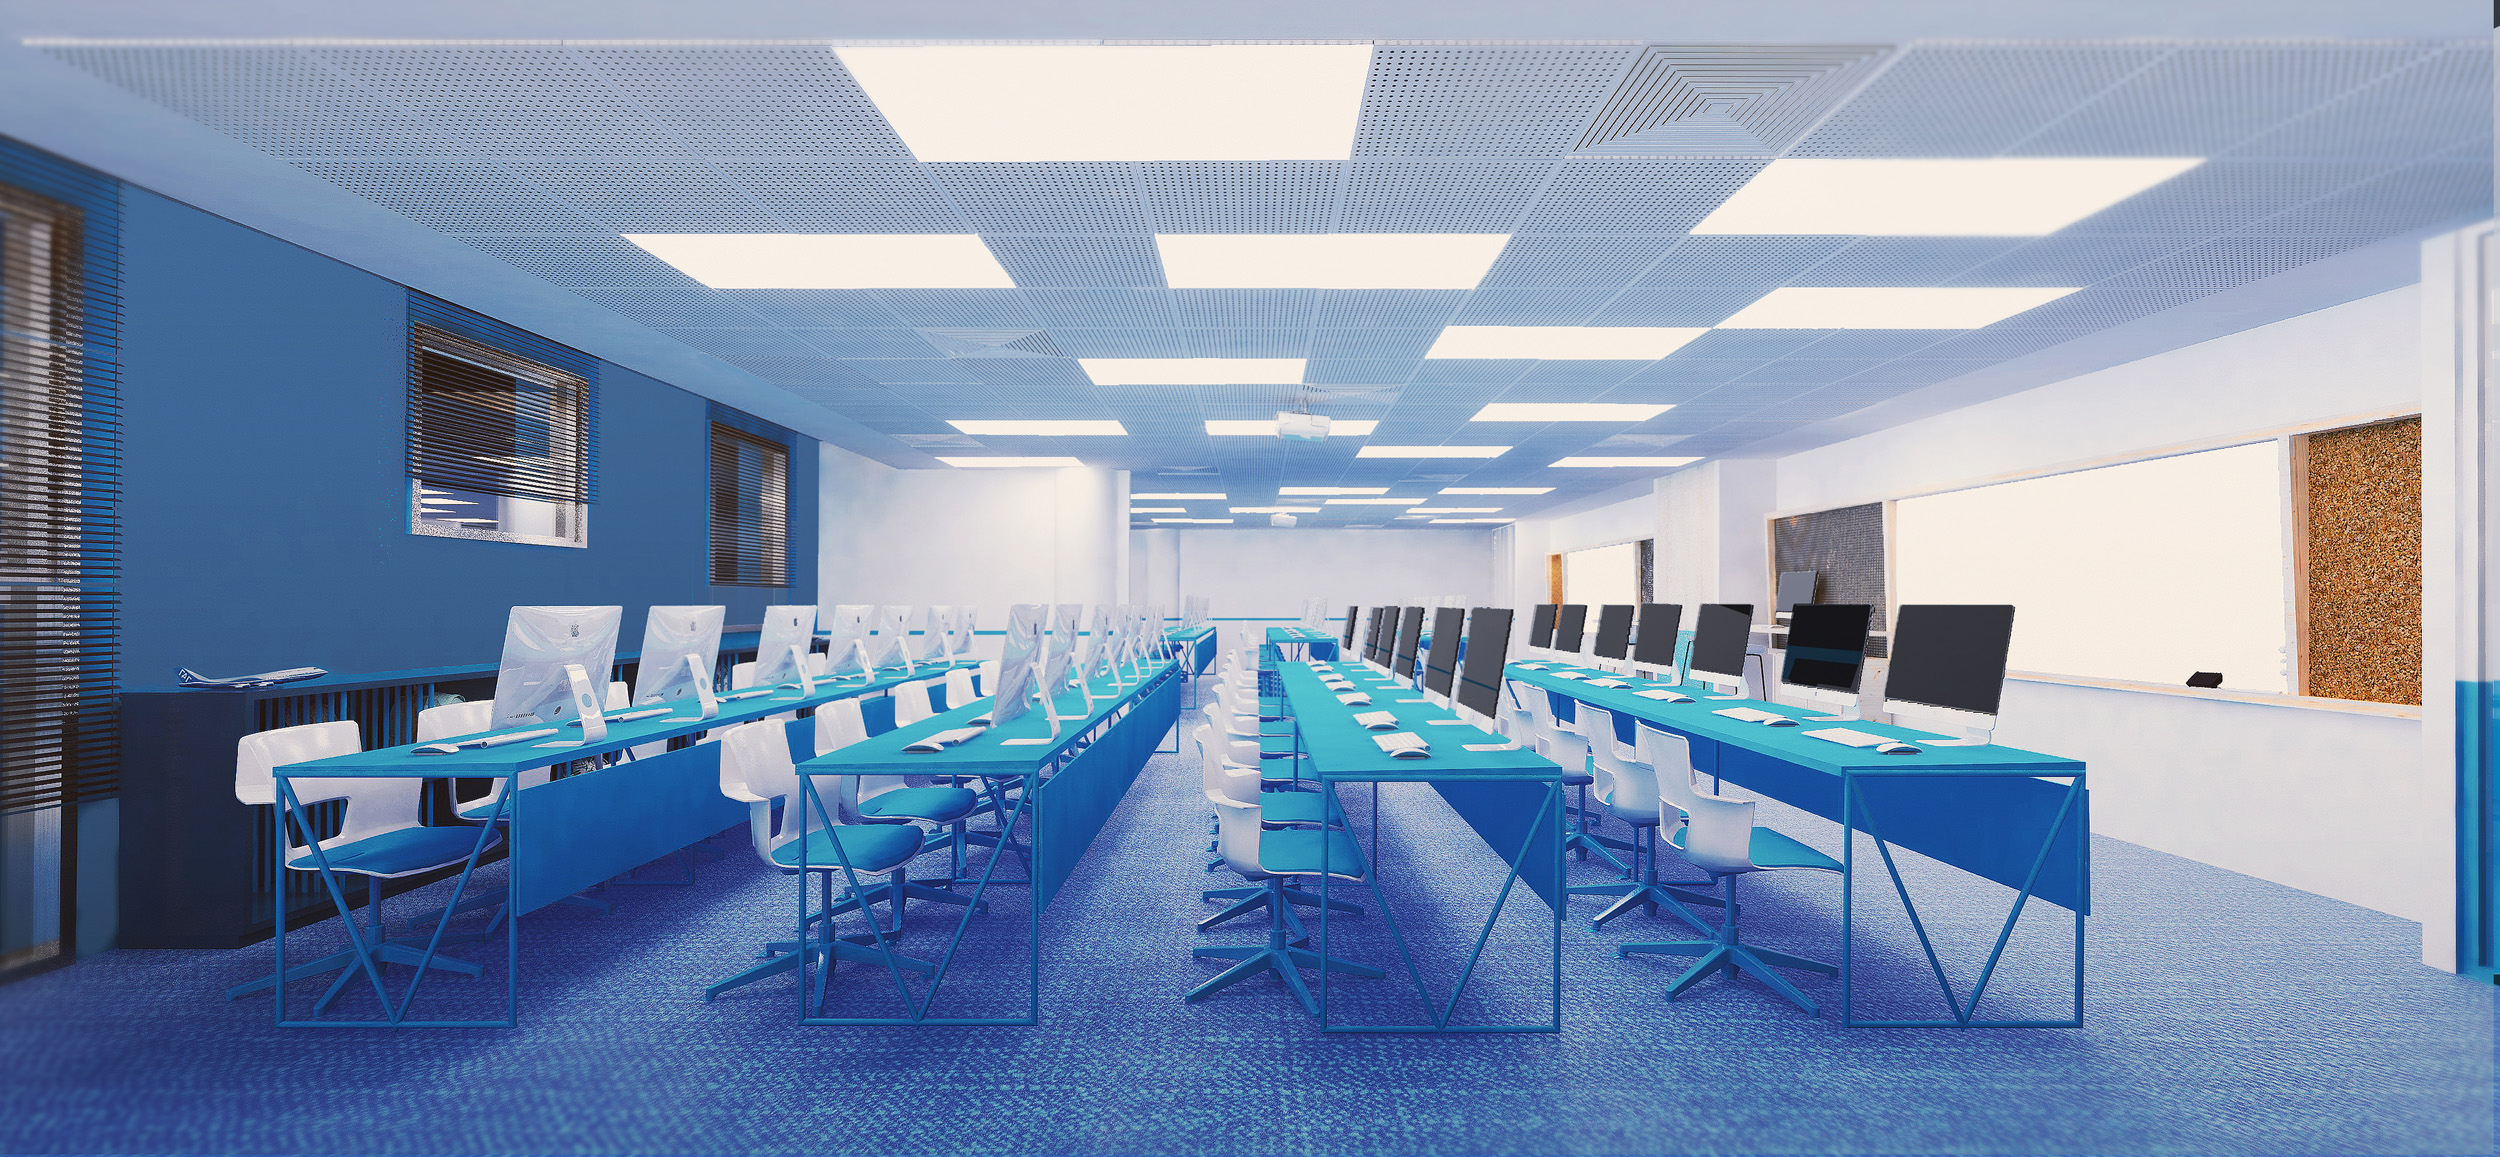 TRAINING CENTER |  Gila Shemie Zakay Interior Design